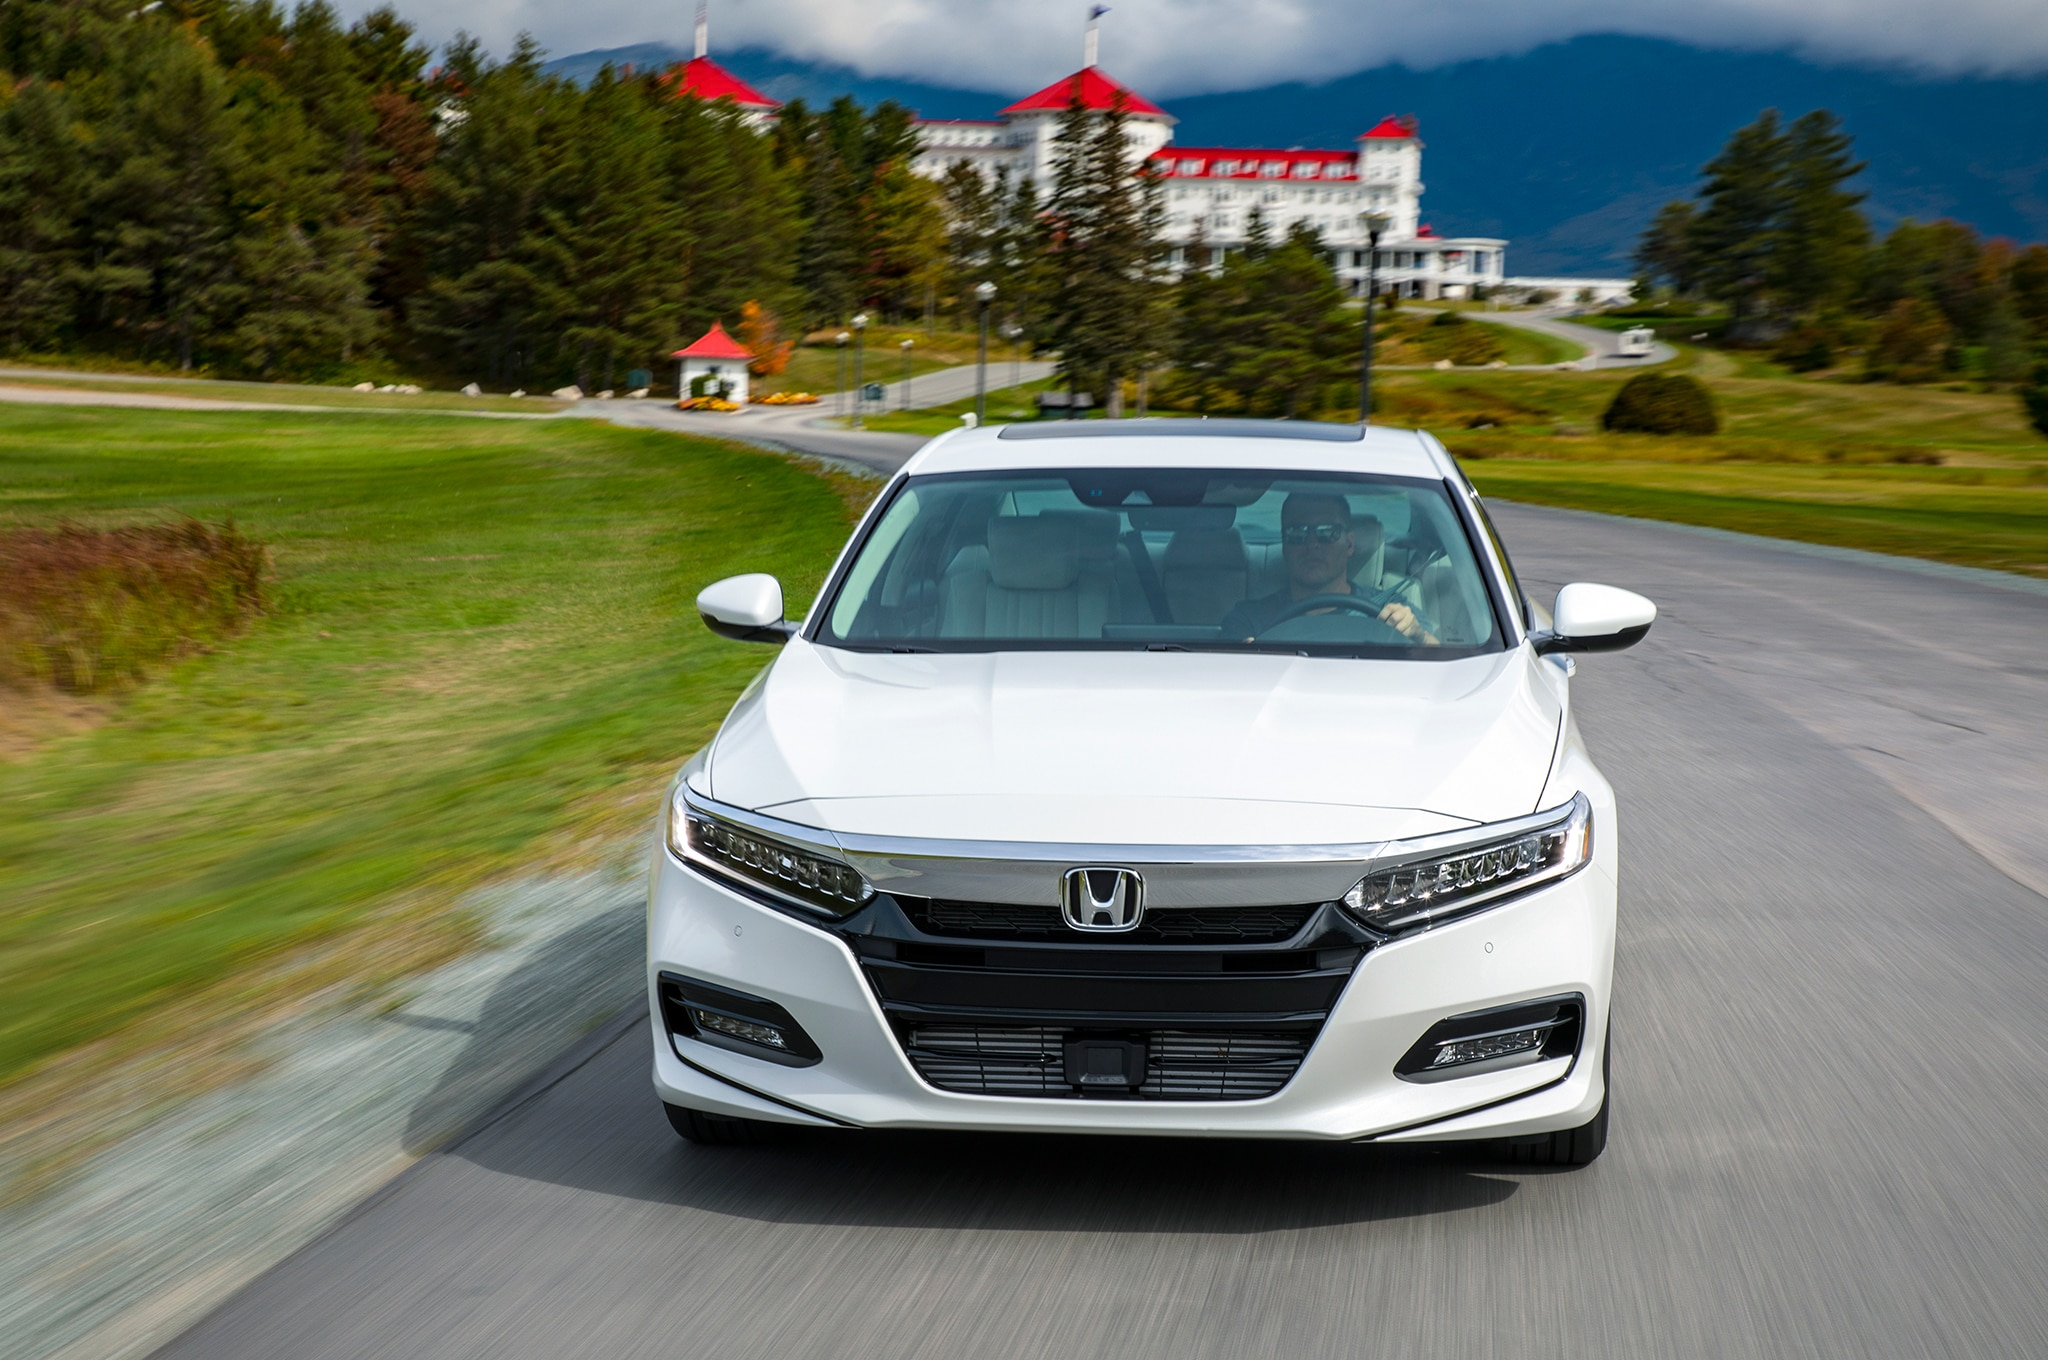 2018 Honda Accord Configurator is Live